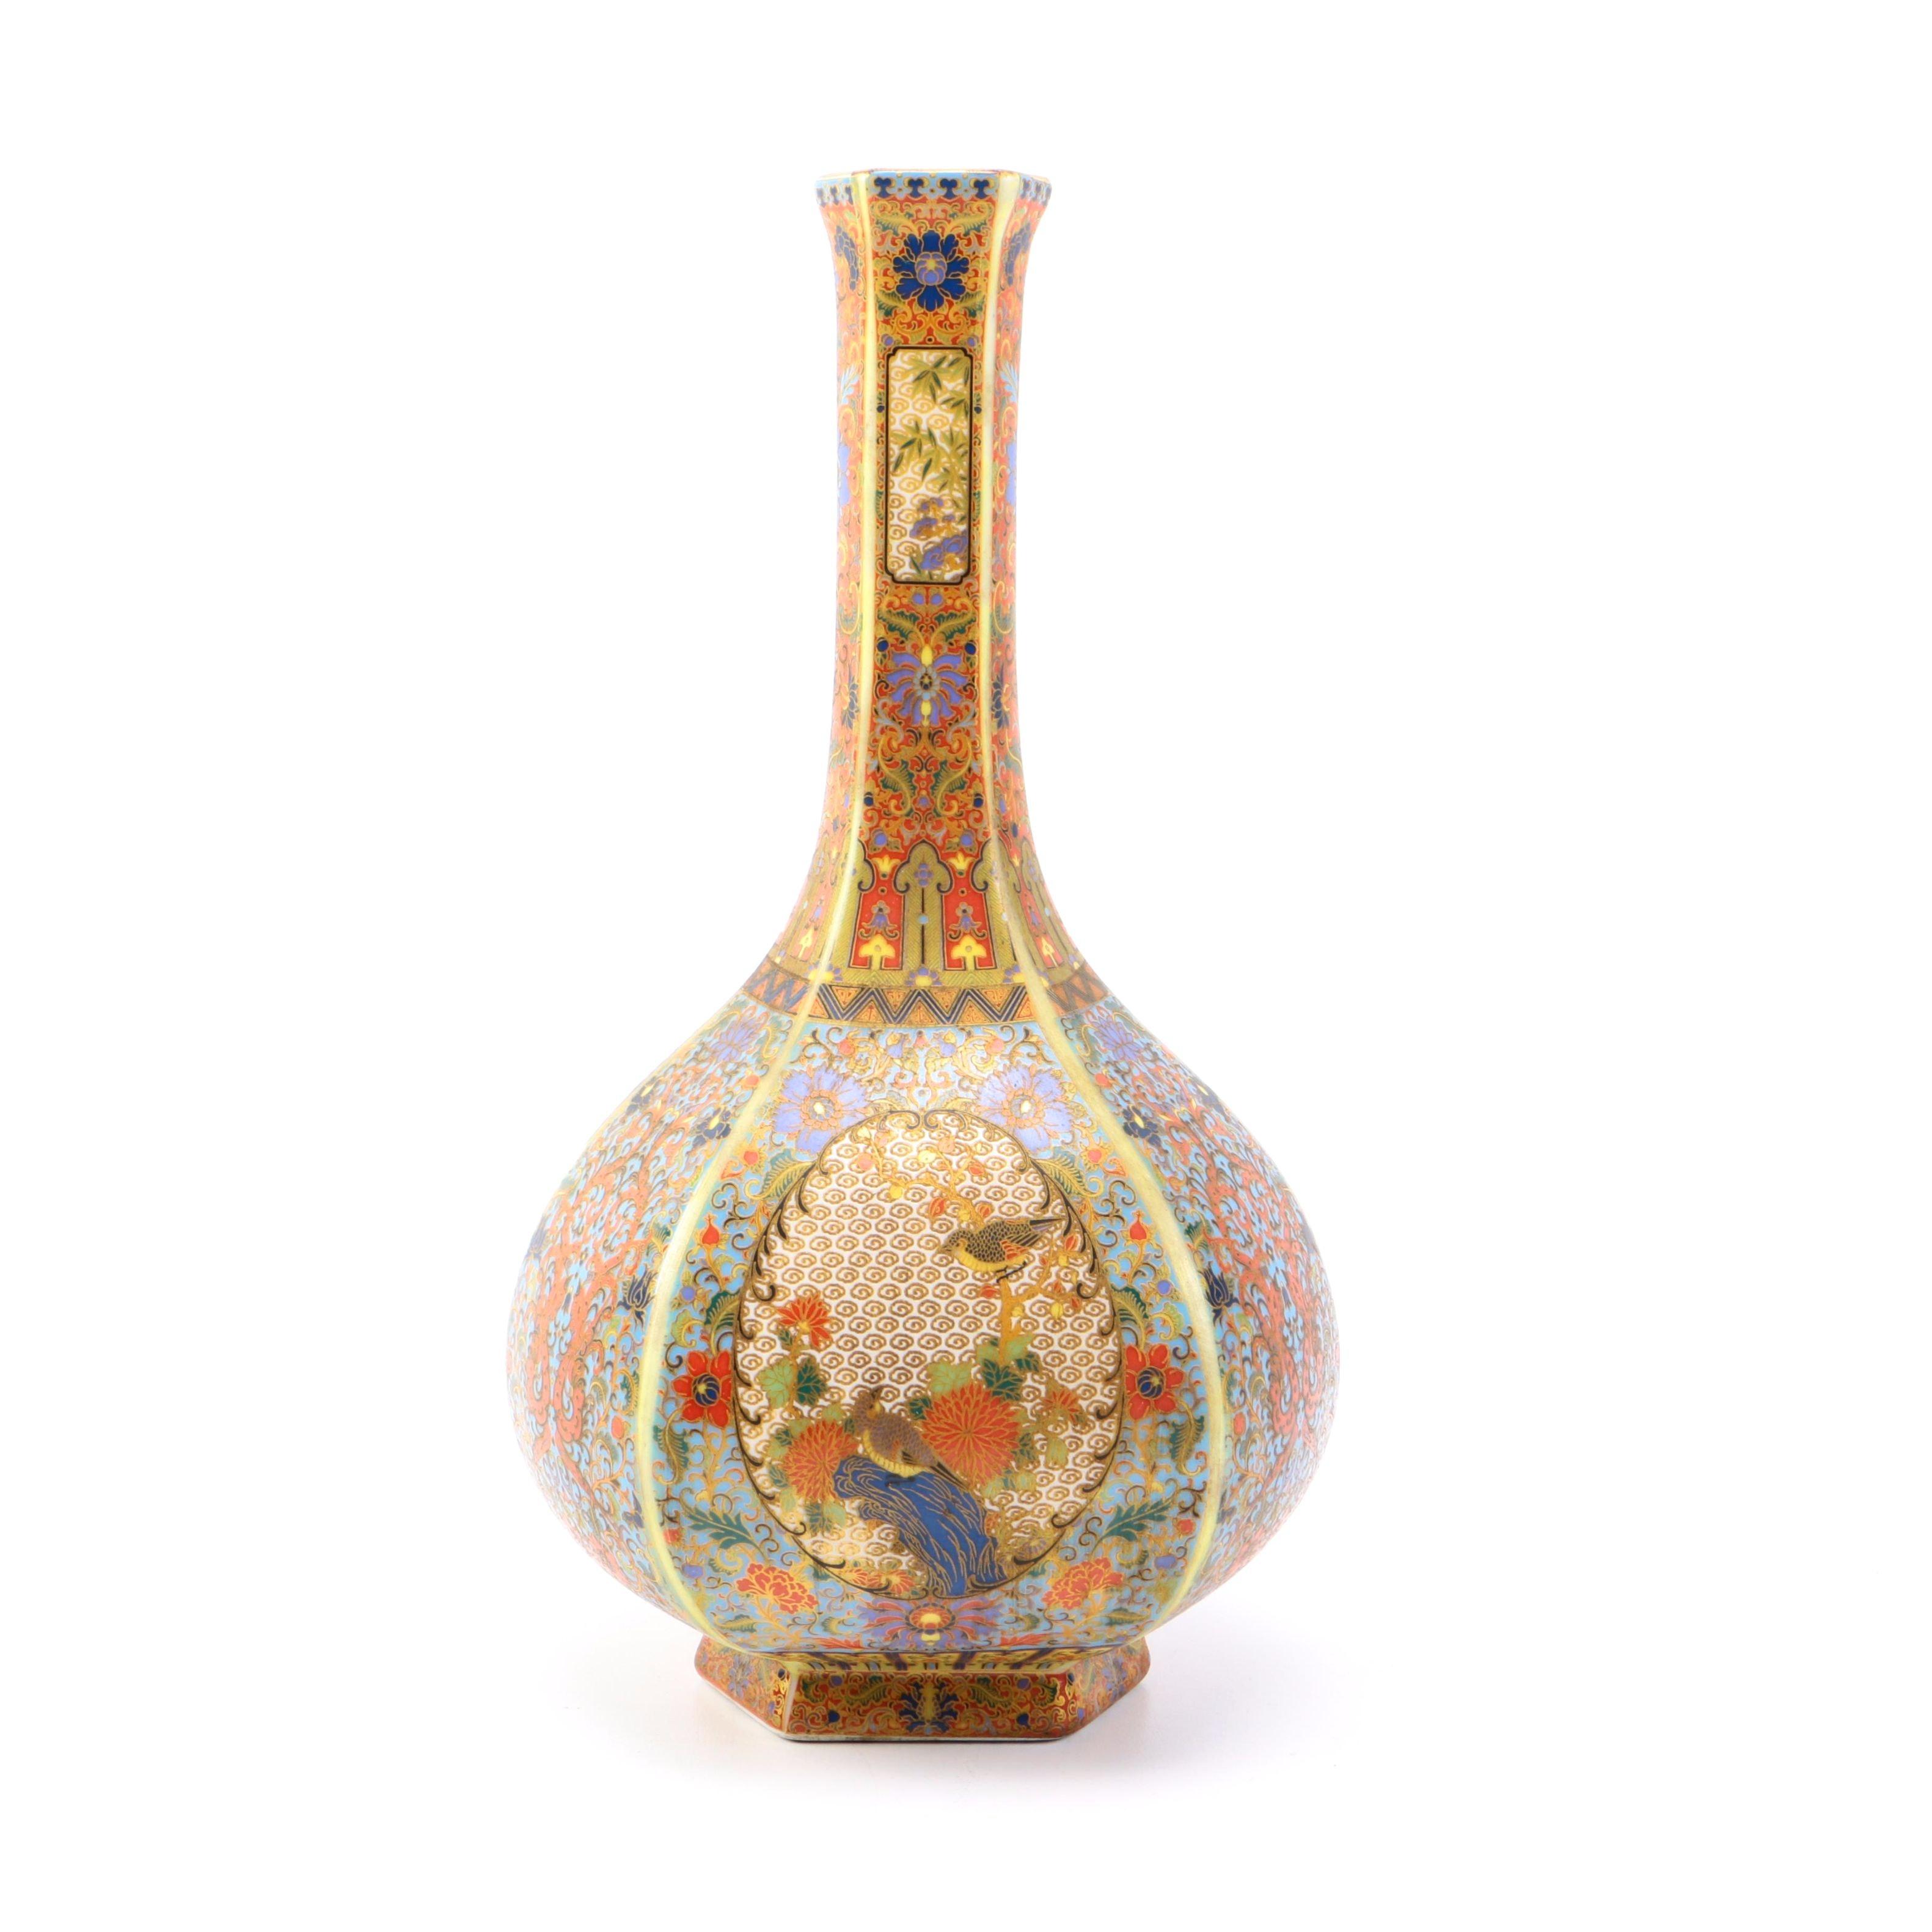 Floral Chinese Ceramic Vase